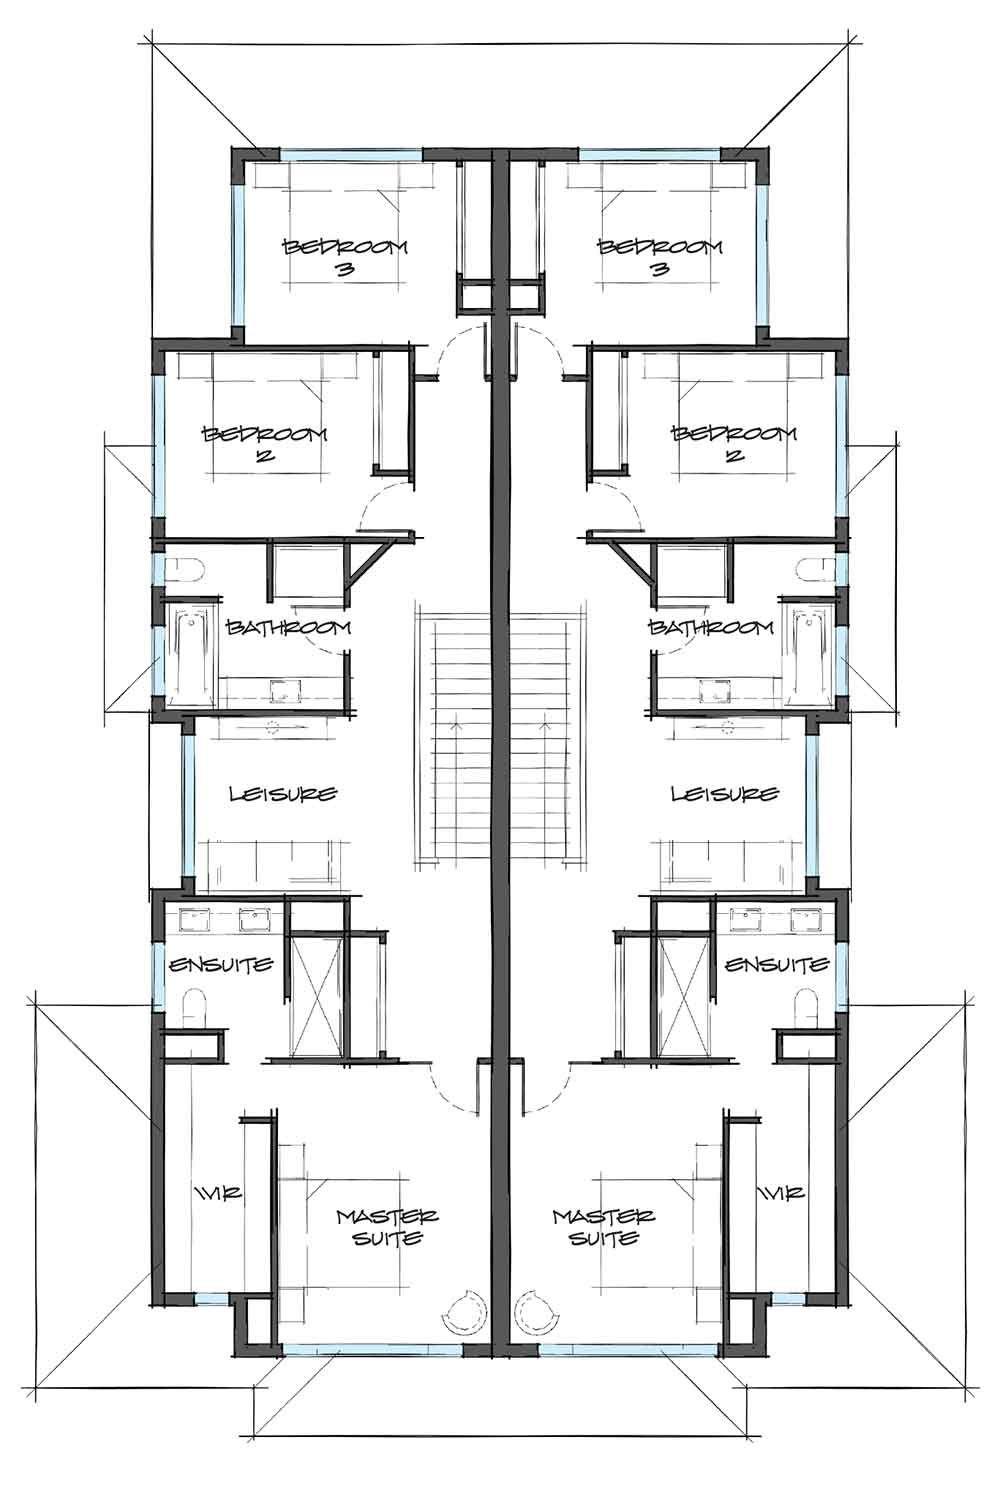 Dual Occupancy Carter Grange Homes Melbourne Duplex Floor